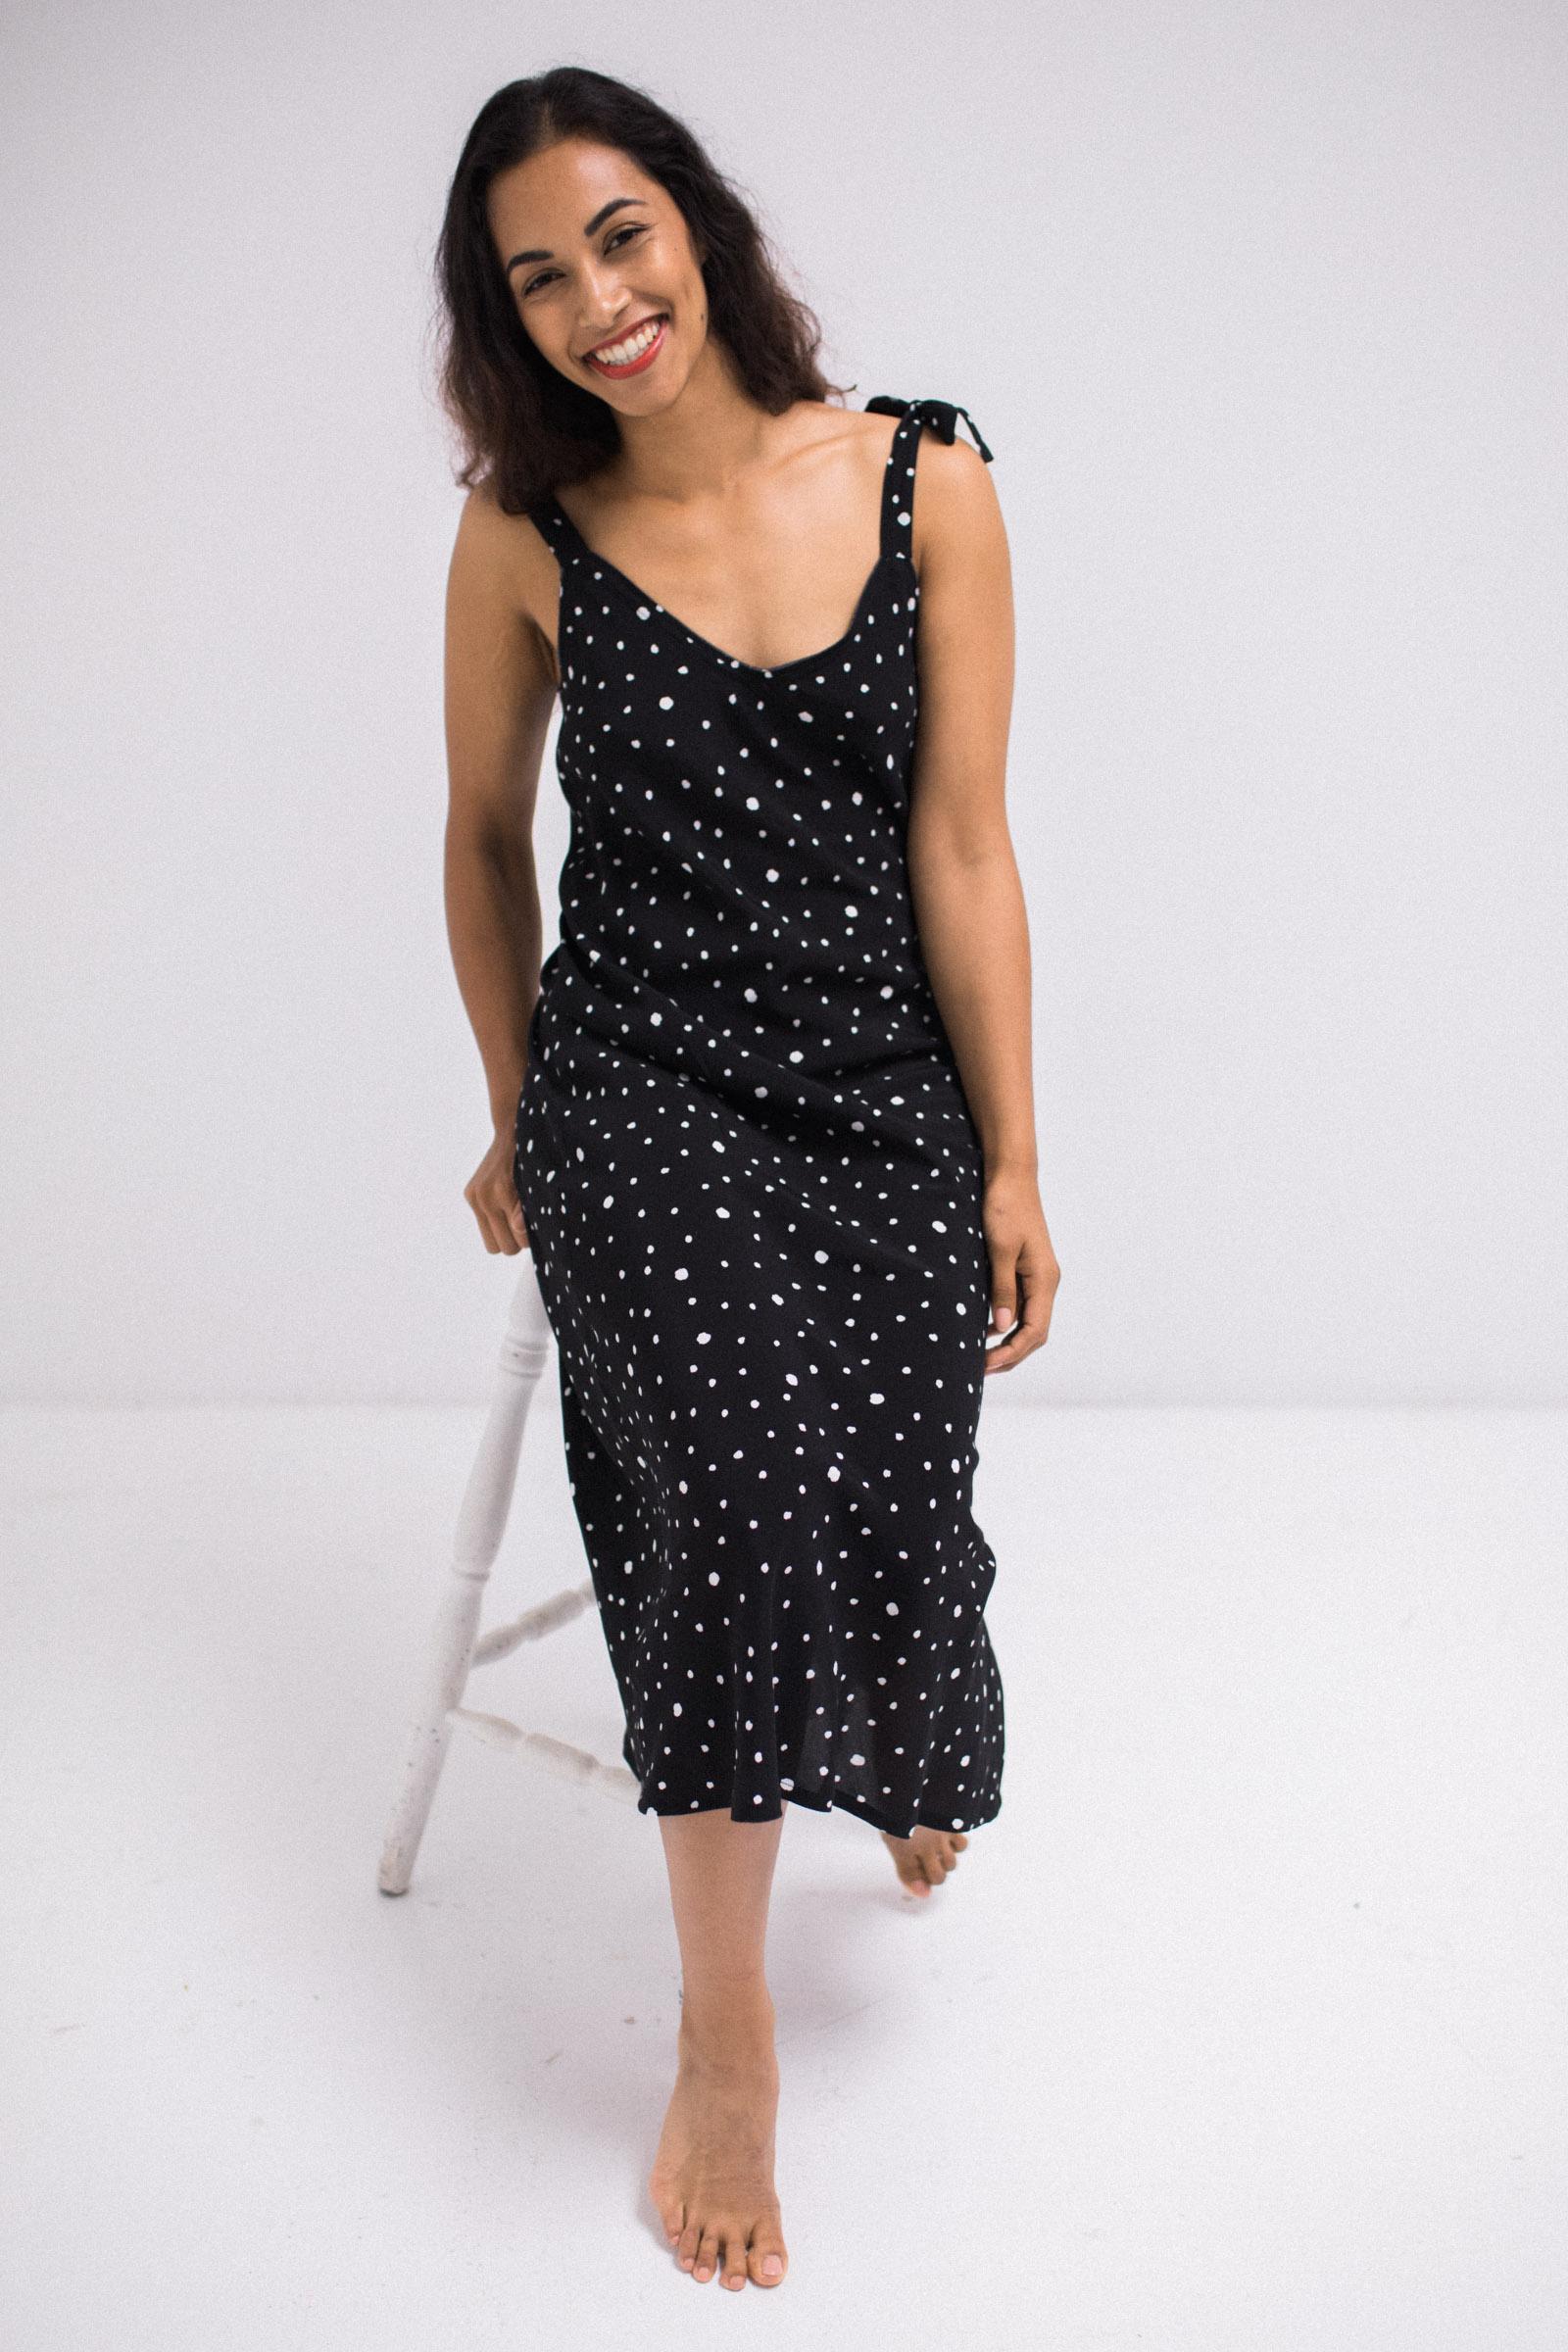 Bias Slip Dress (Black/White) - $315